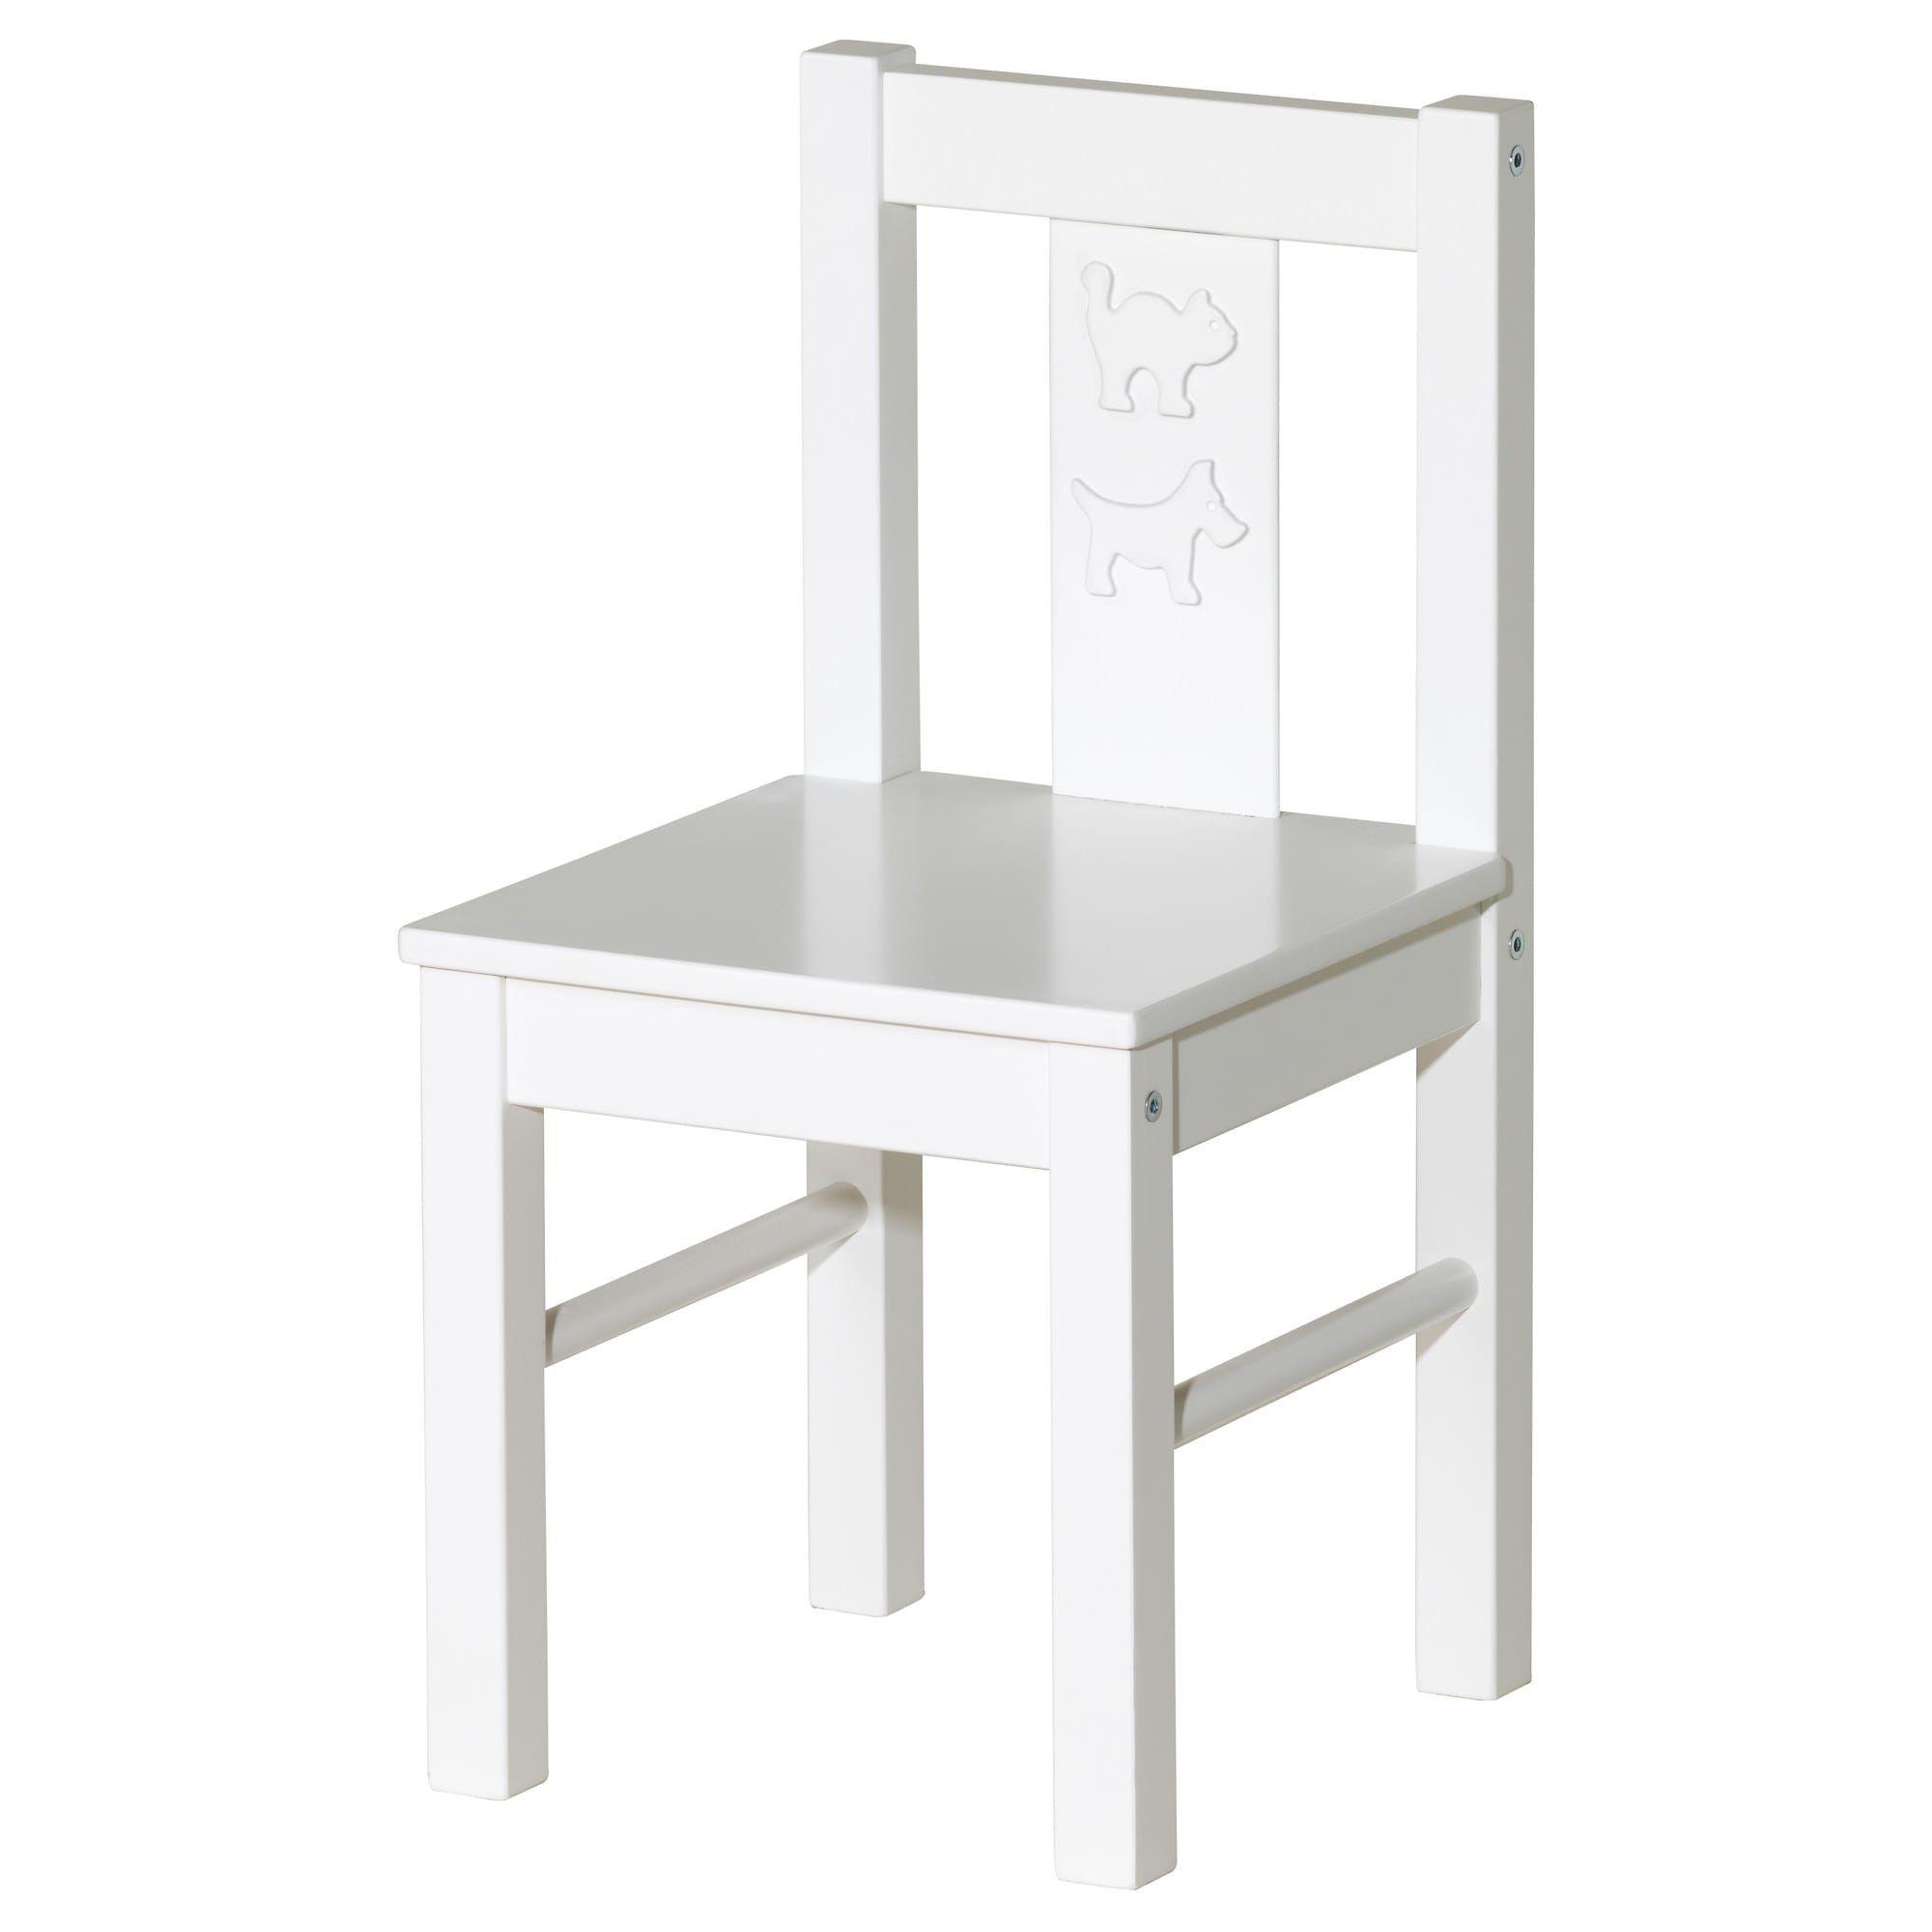 KRITTER chair, IKEA   Sessel kinderzimmer, Ikea stuhl ...